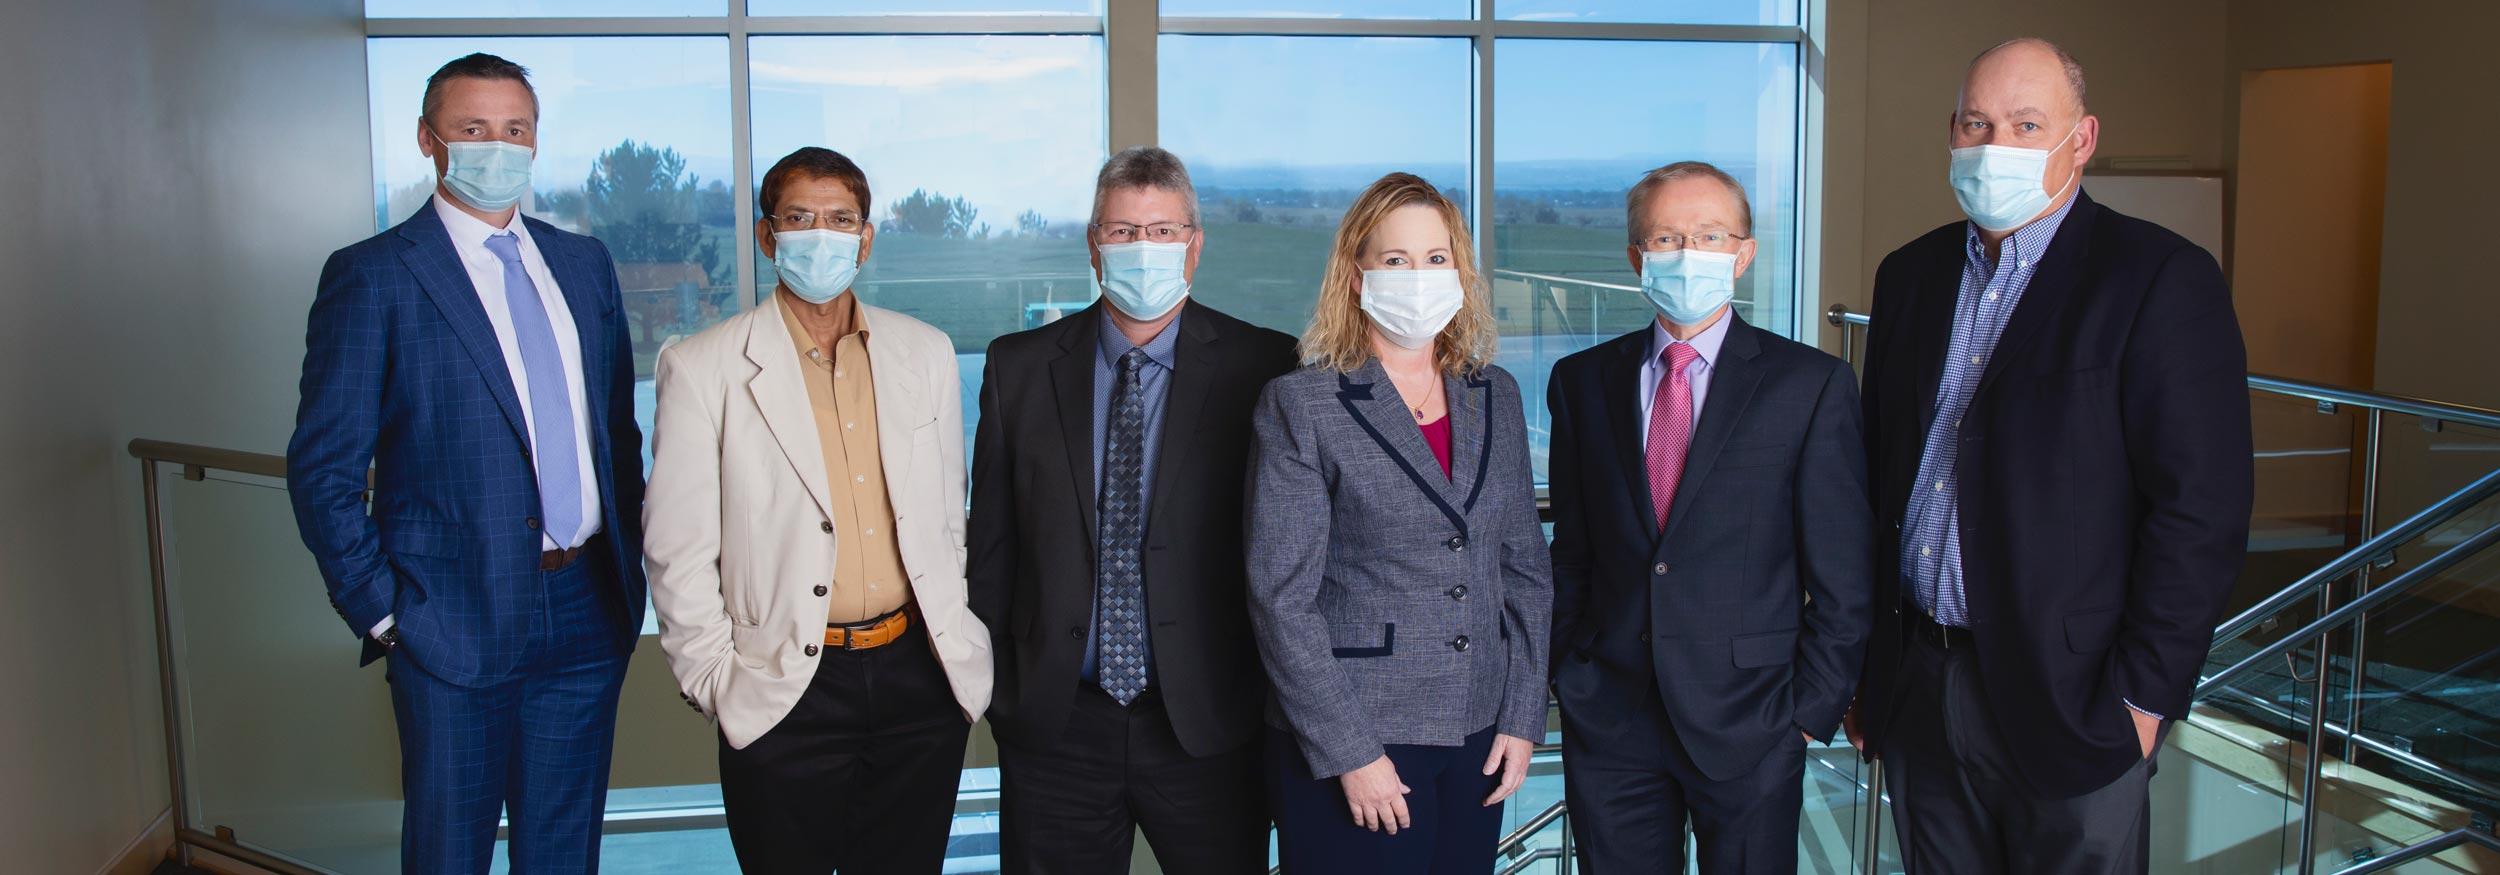 Leadership team in masks